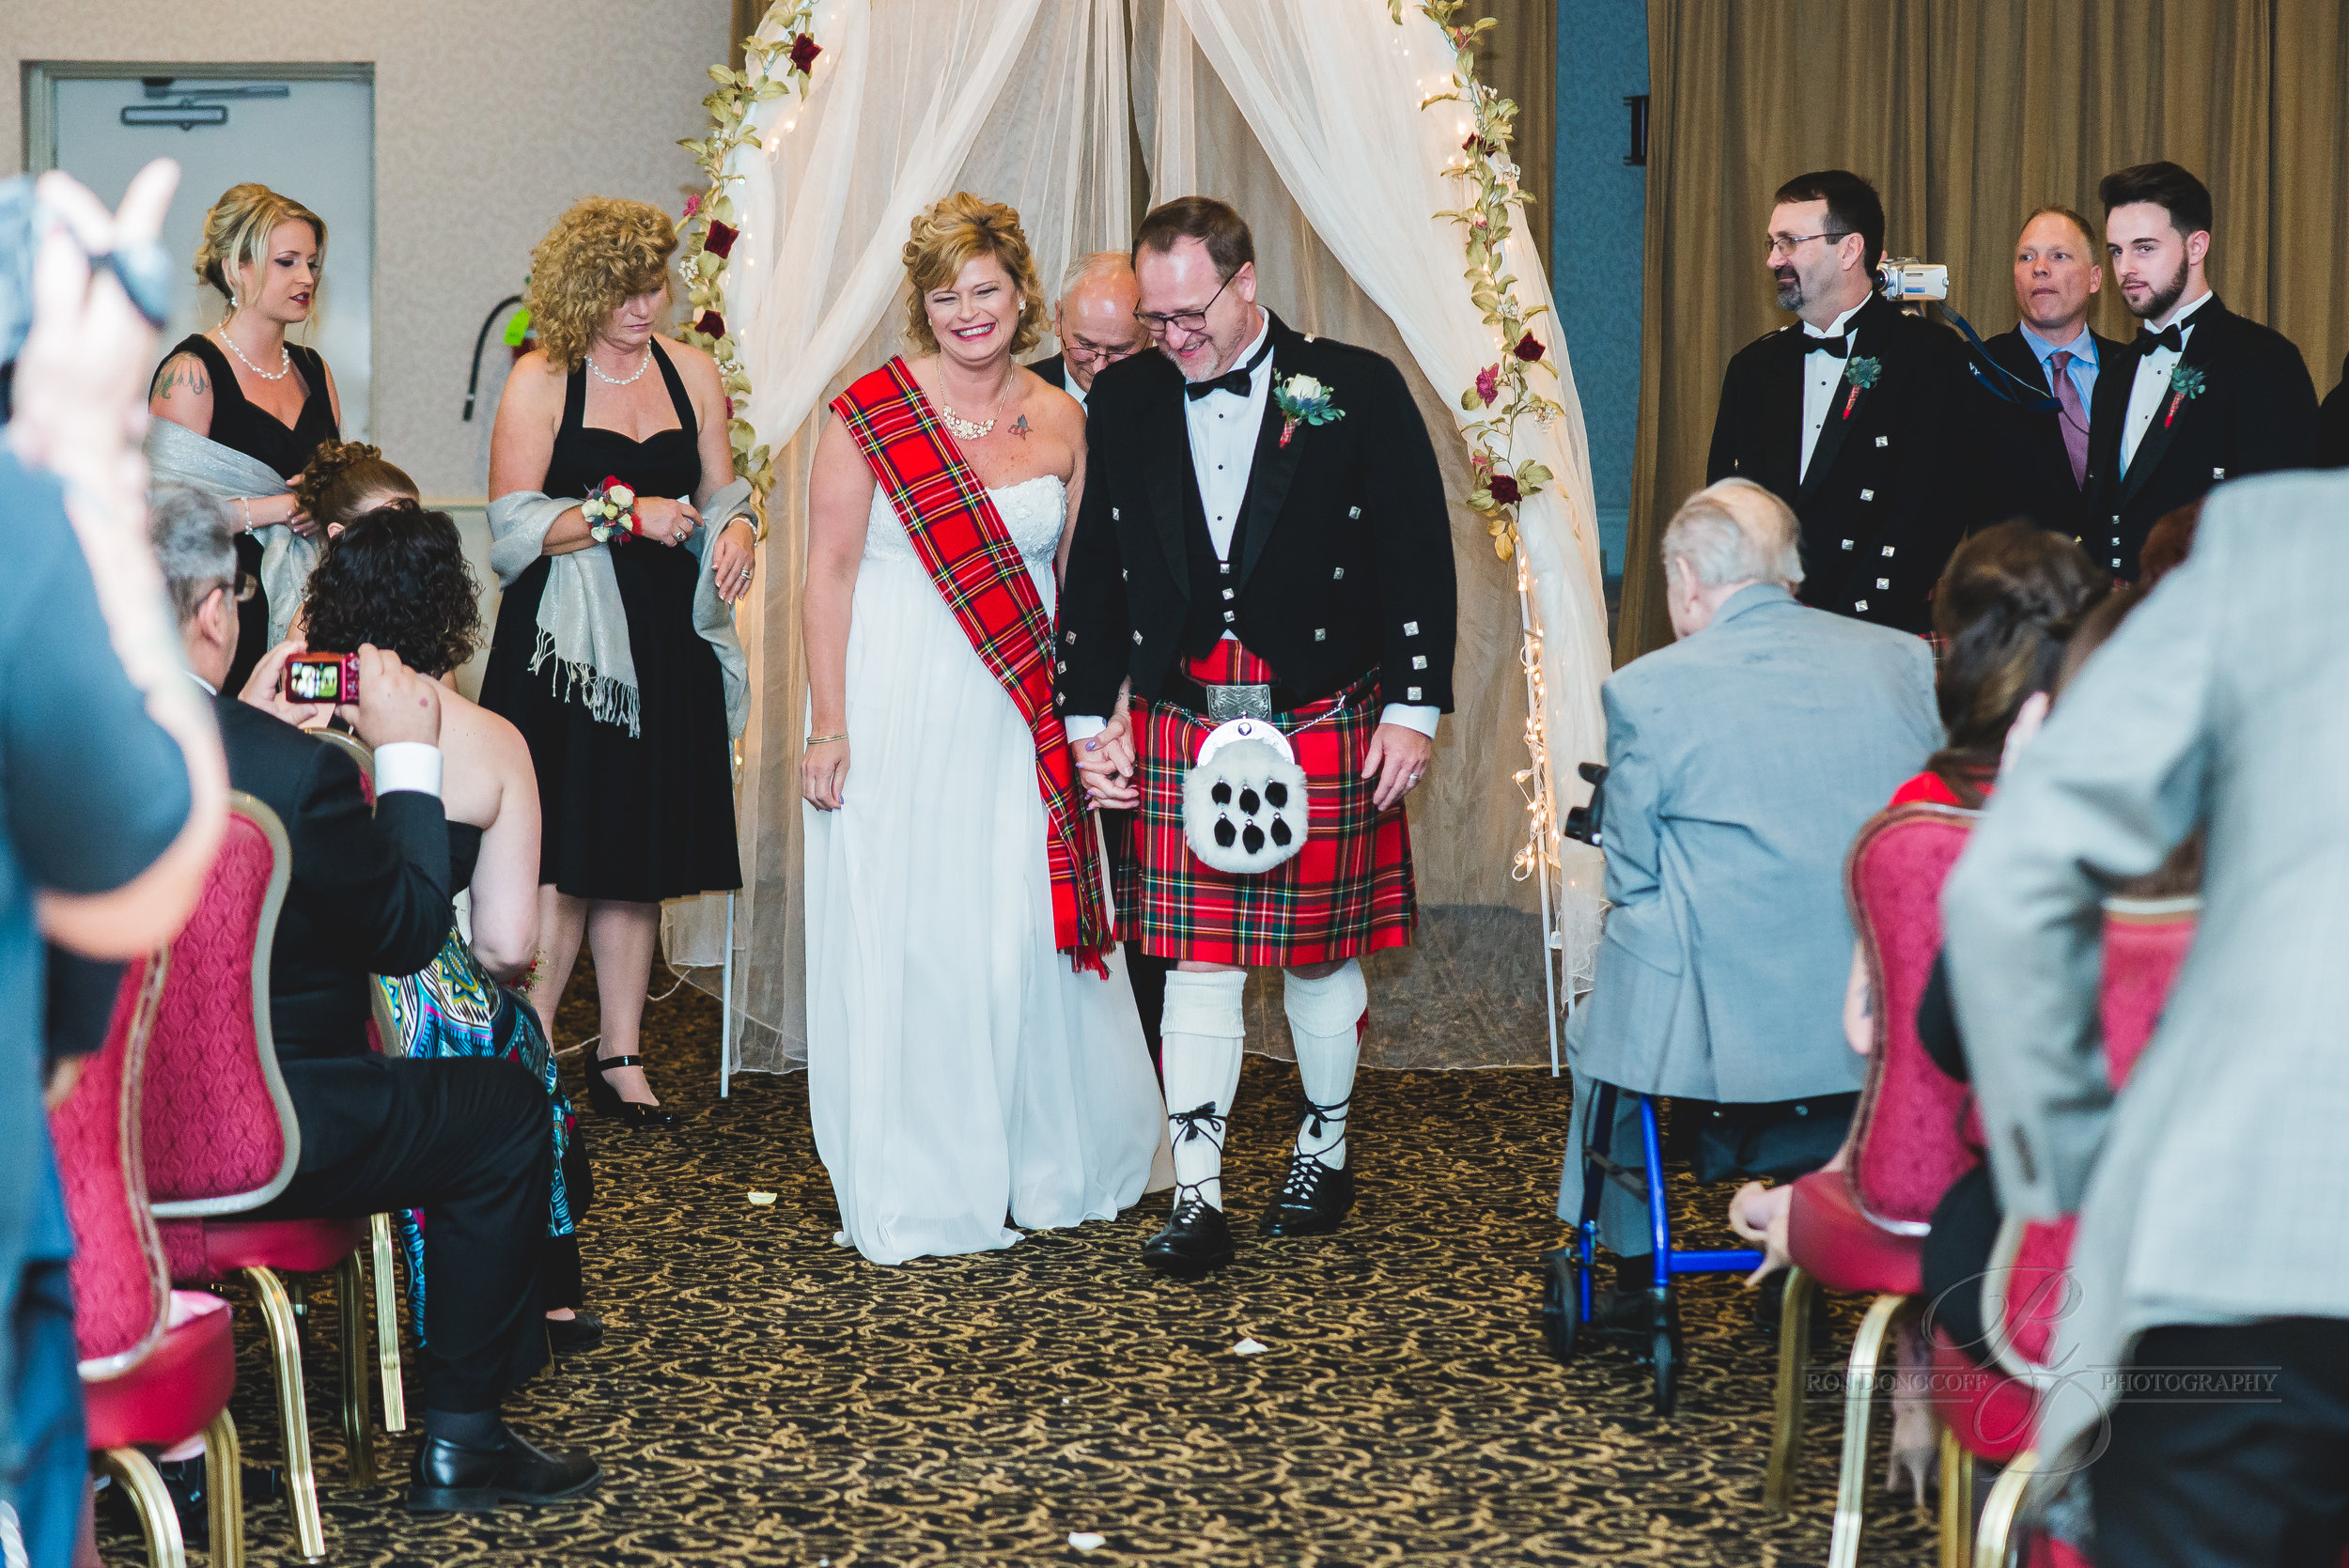 170225 - Annamae & John Wedding - Blog (9 of 19).jpg